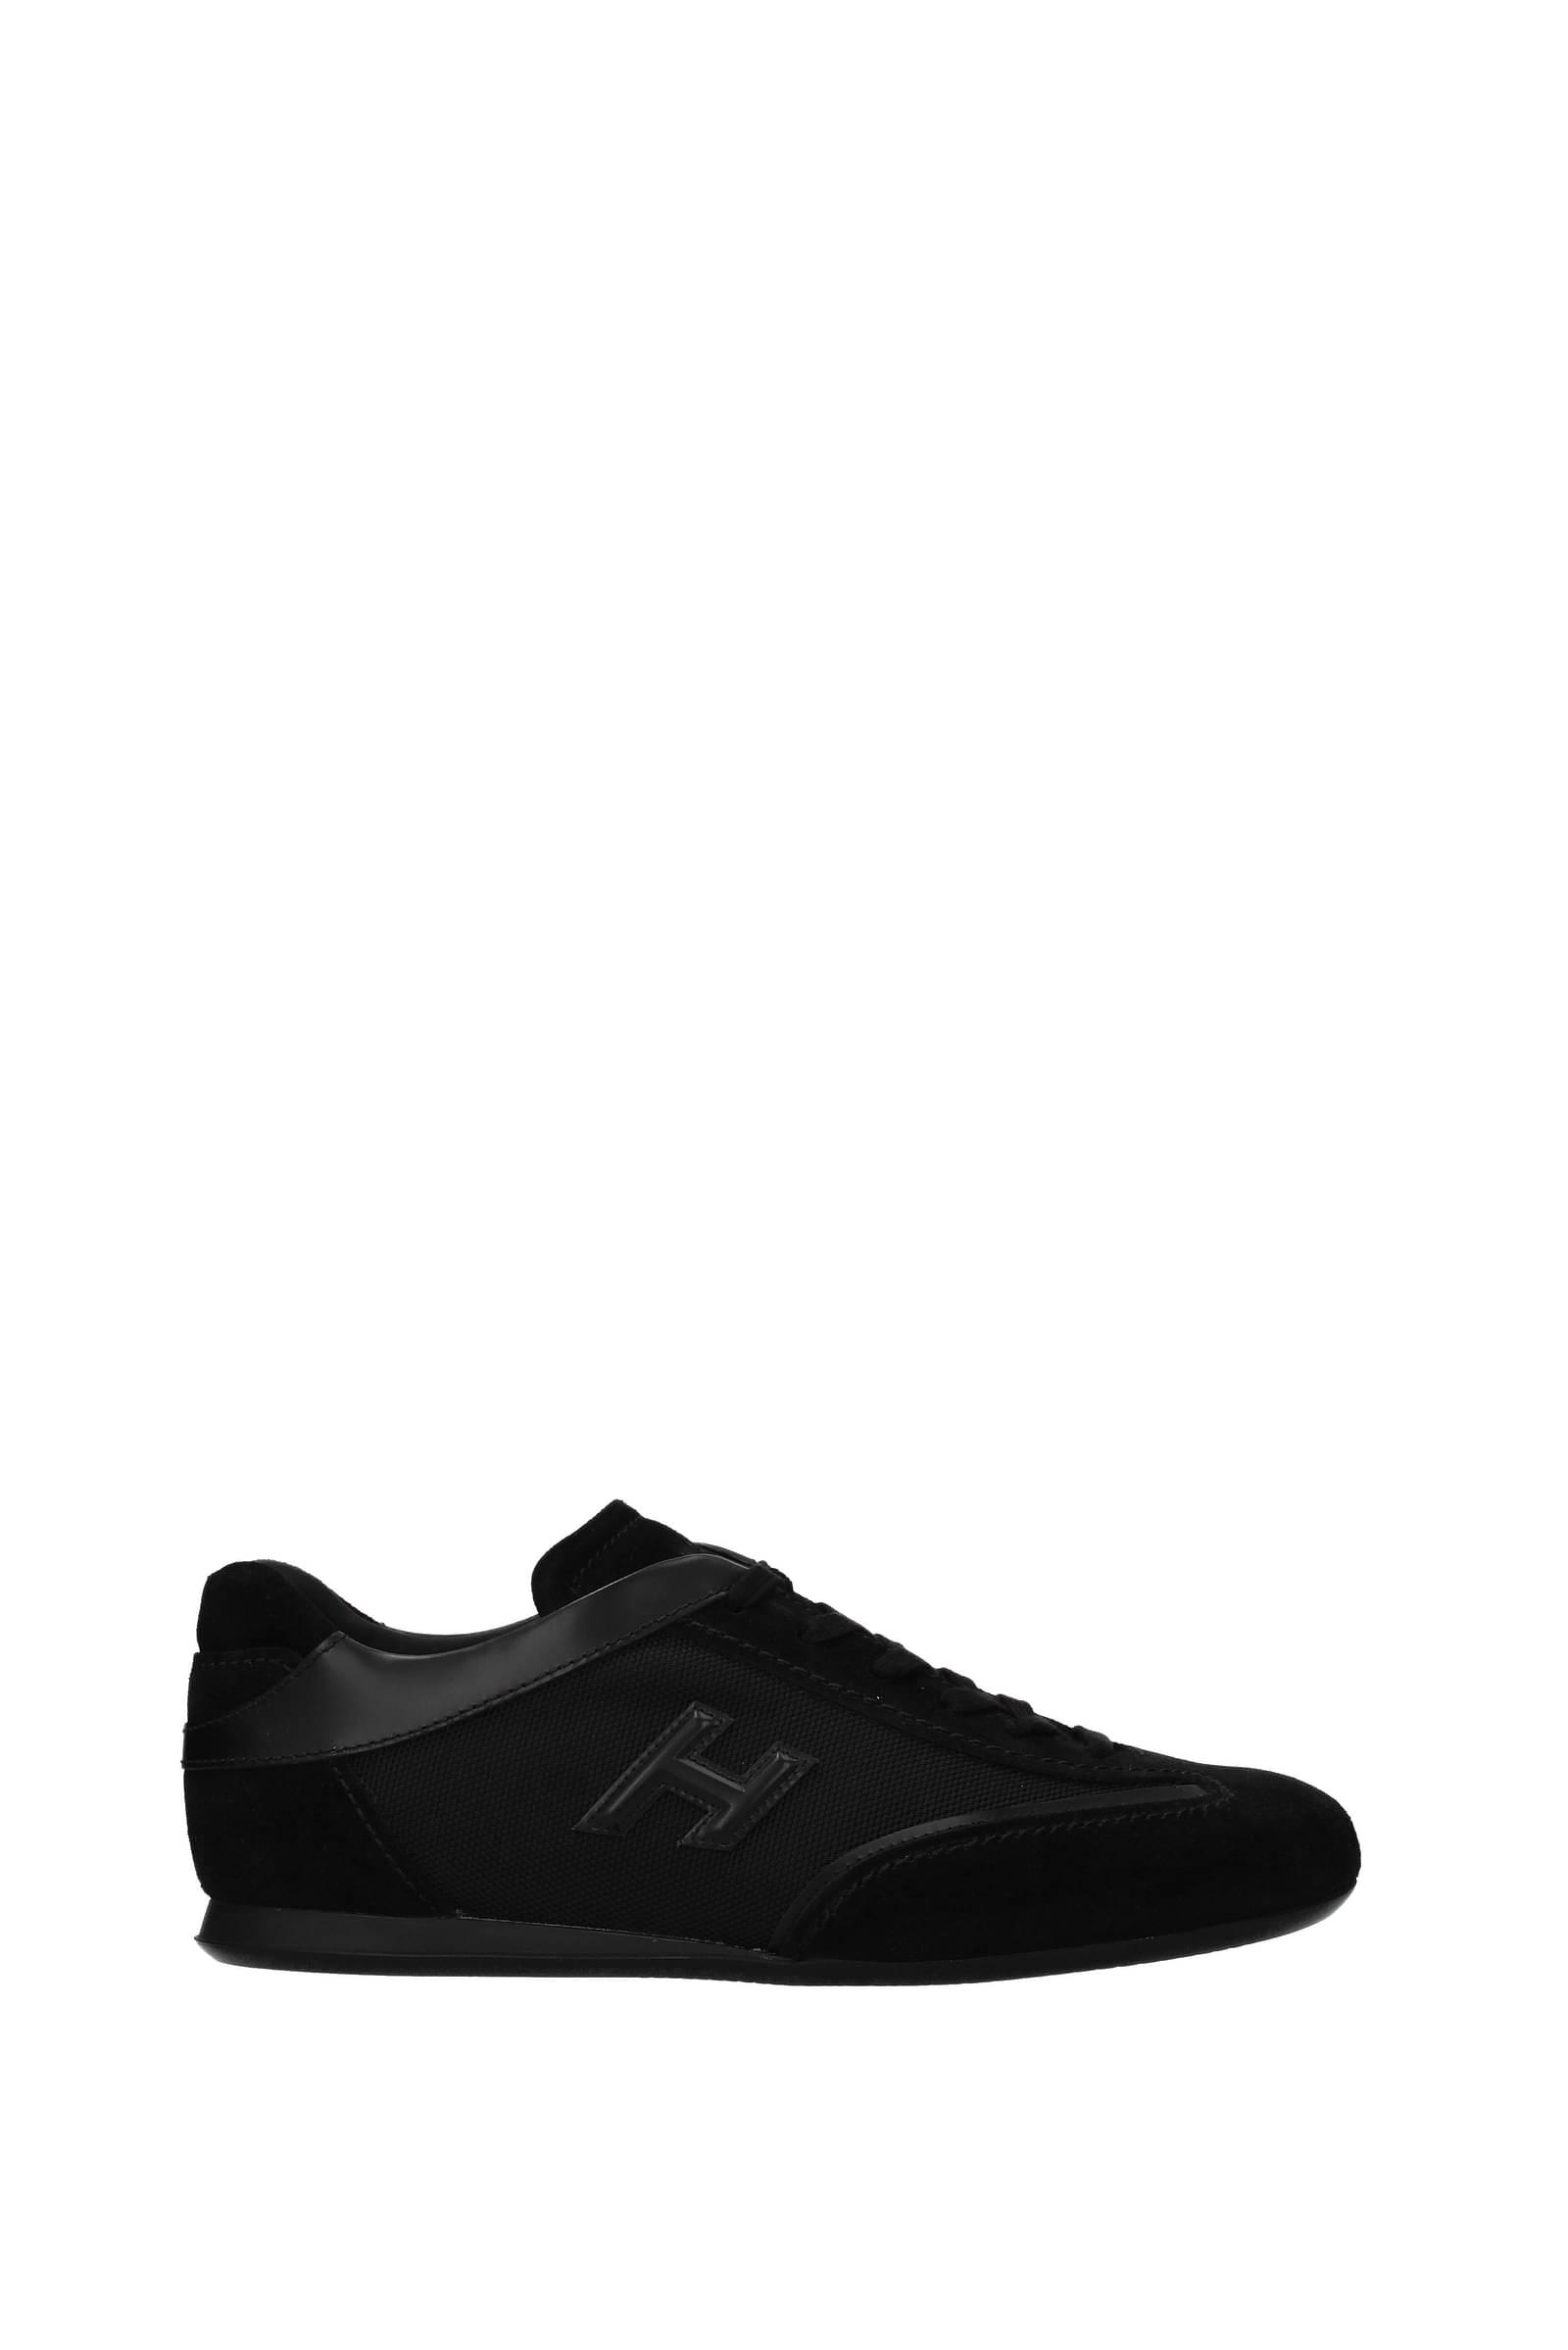 Hogan Sneakers olympia Uomo HXM0570I972JC8B999 Tessuto 152,25€